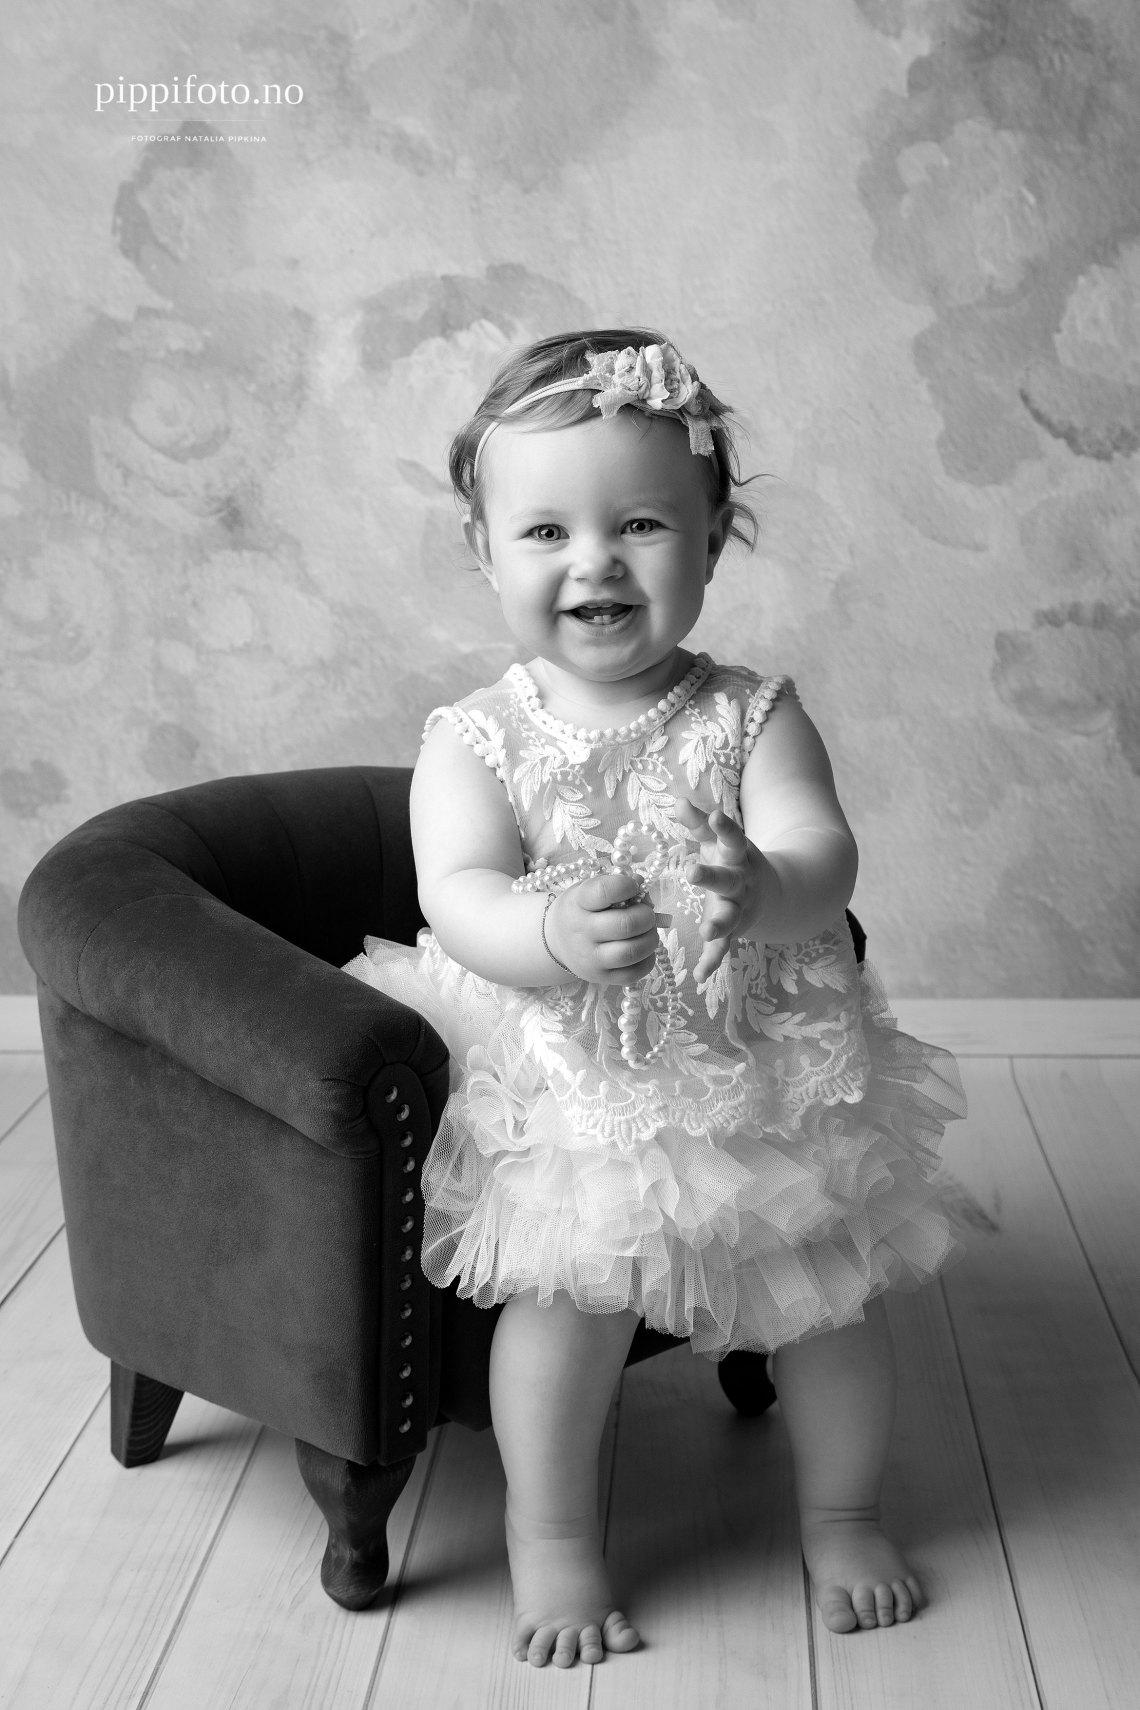 barnefoto-barnfotografering-Oslo-barnfotograf-ettårsfotografering-1år-ettårsfoto